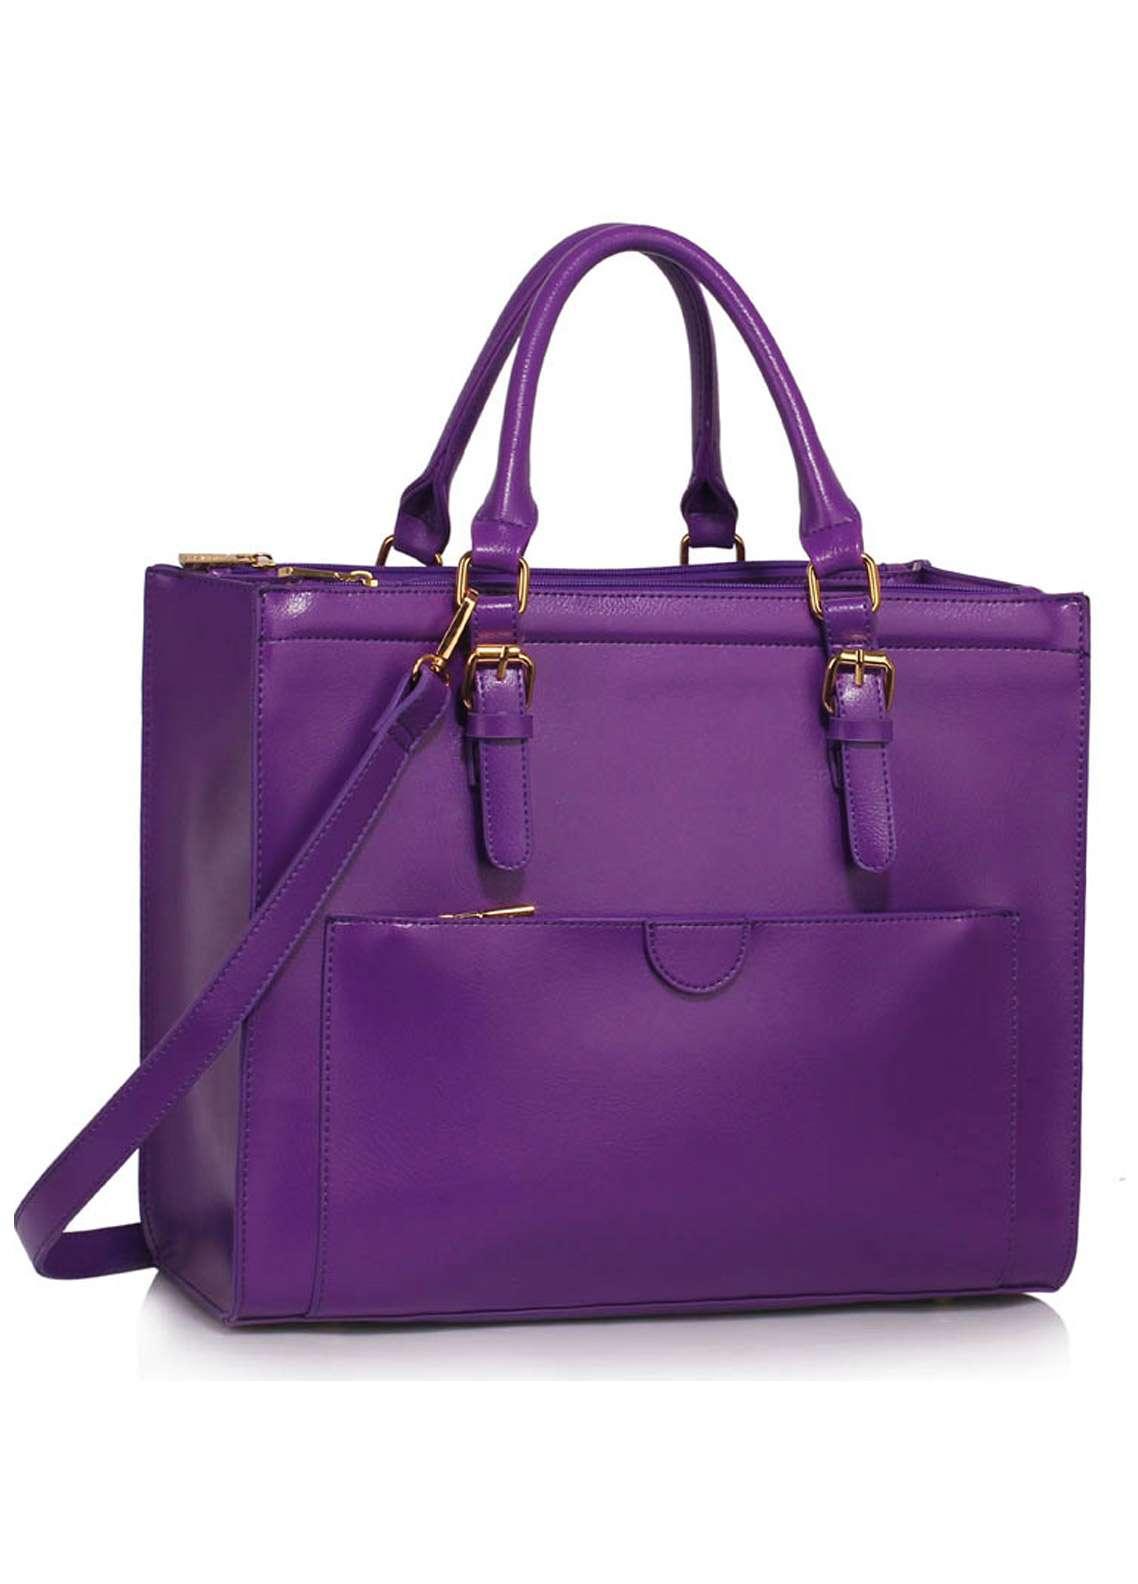 Leesun London Faux Leather Tote Bags for Women Purple